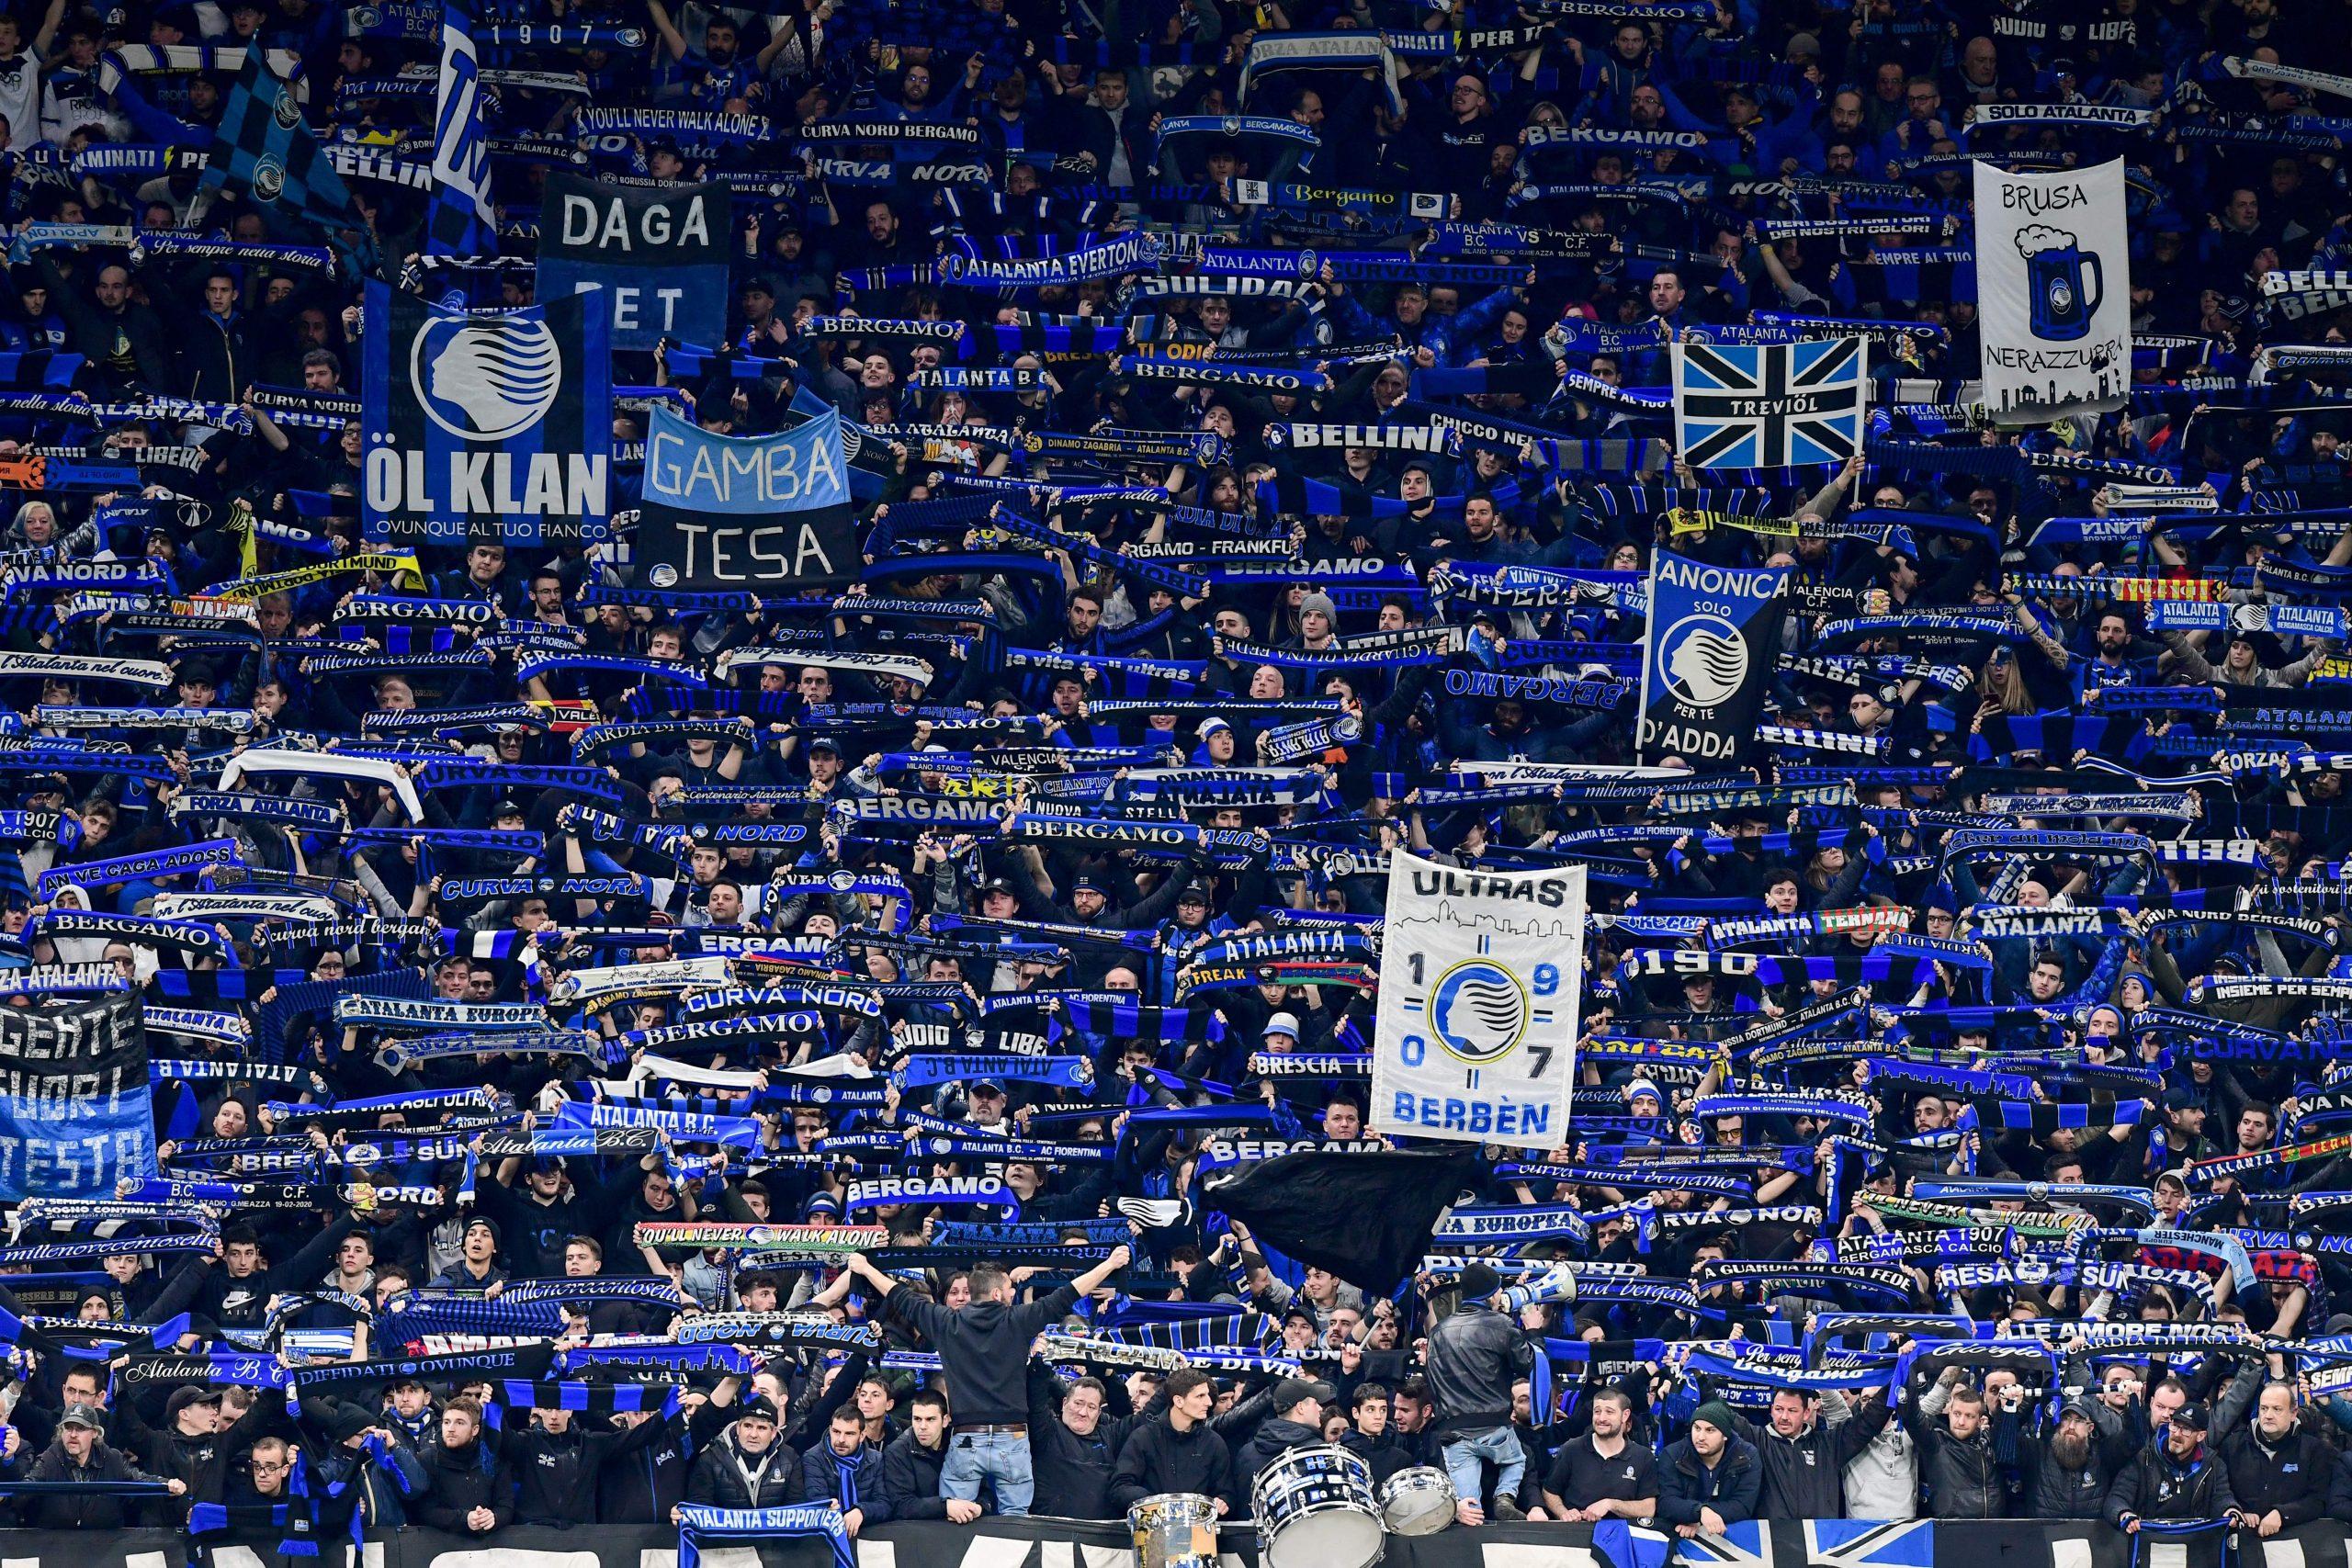 Atalanta fans cheer during the UEFA Champions League round of 16 first leg football match Atalanta Bergamo vs Valencia on February 19, 2020 at the San Siro stadium in Milan. (Photo by Miguel MEDINA / AFP) (Photo by MIGUEL MEDINA/AFP via Getty Images)